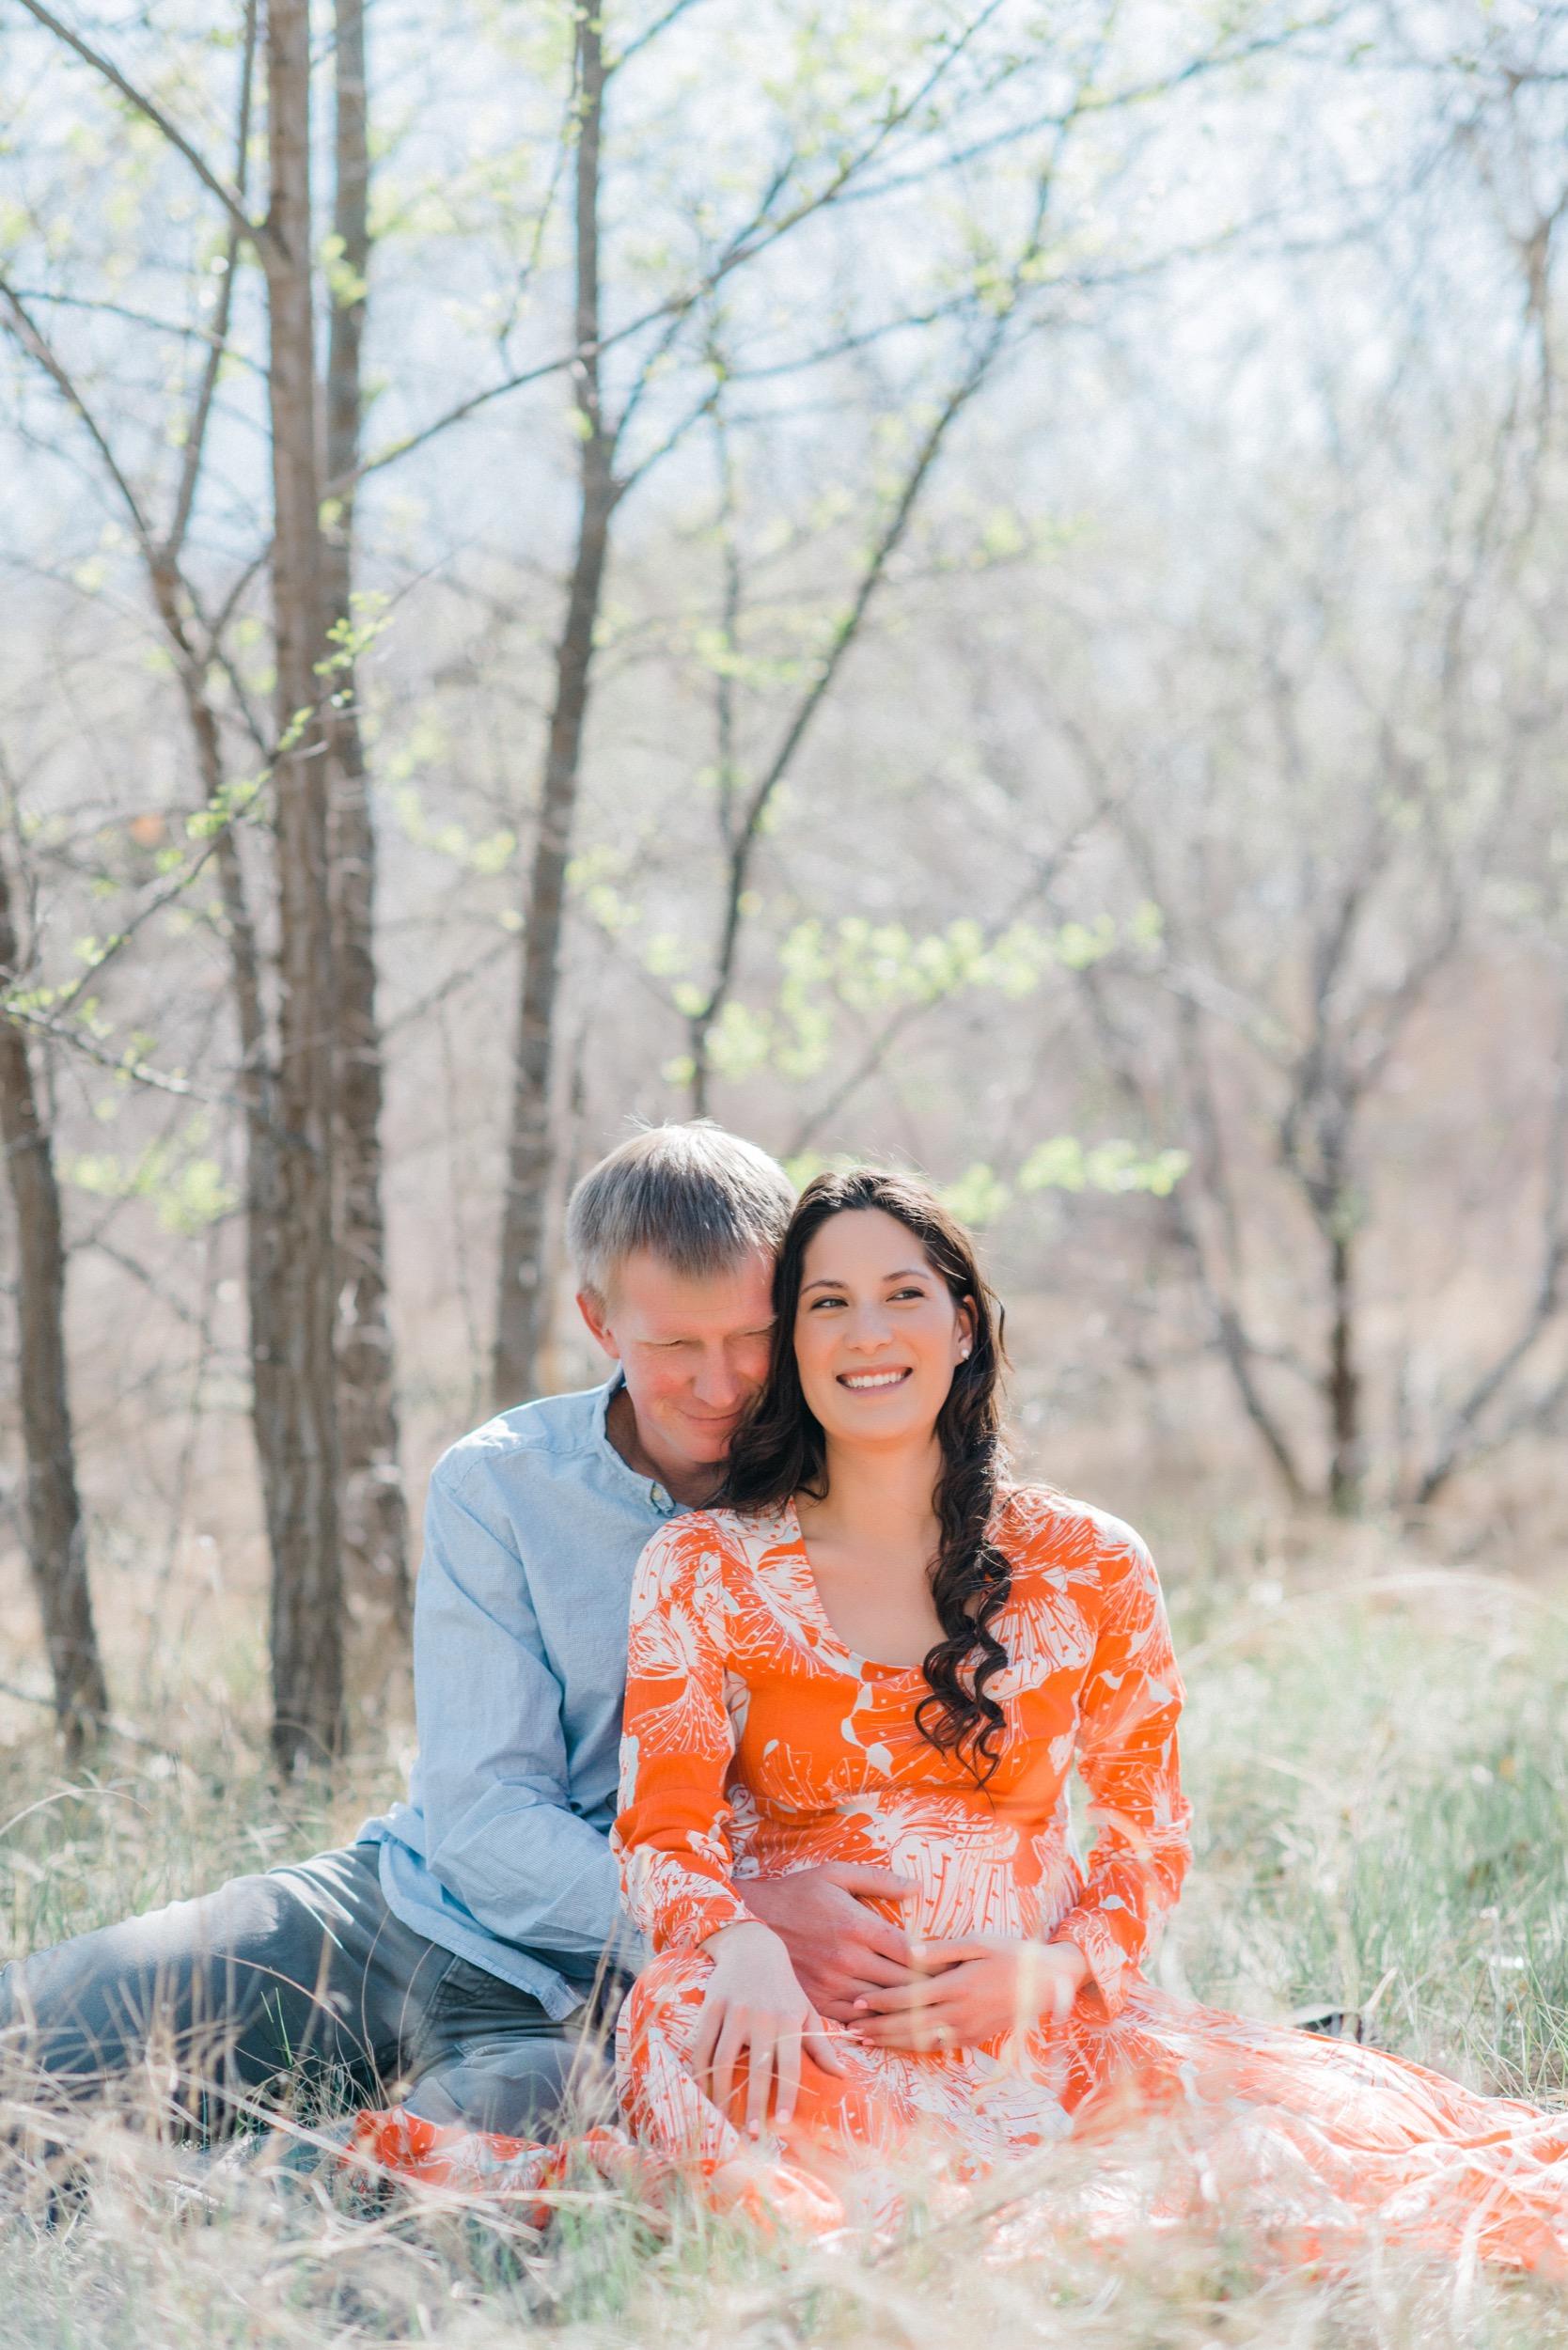 Carissa and Ben-maternity-southwest photographer-destination photographer-new mexico wedding-1023.jpg